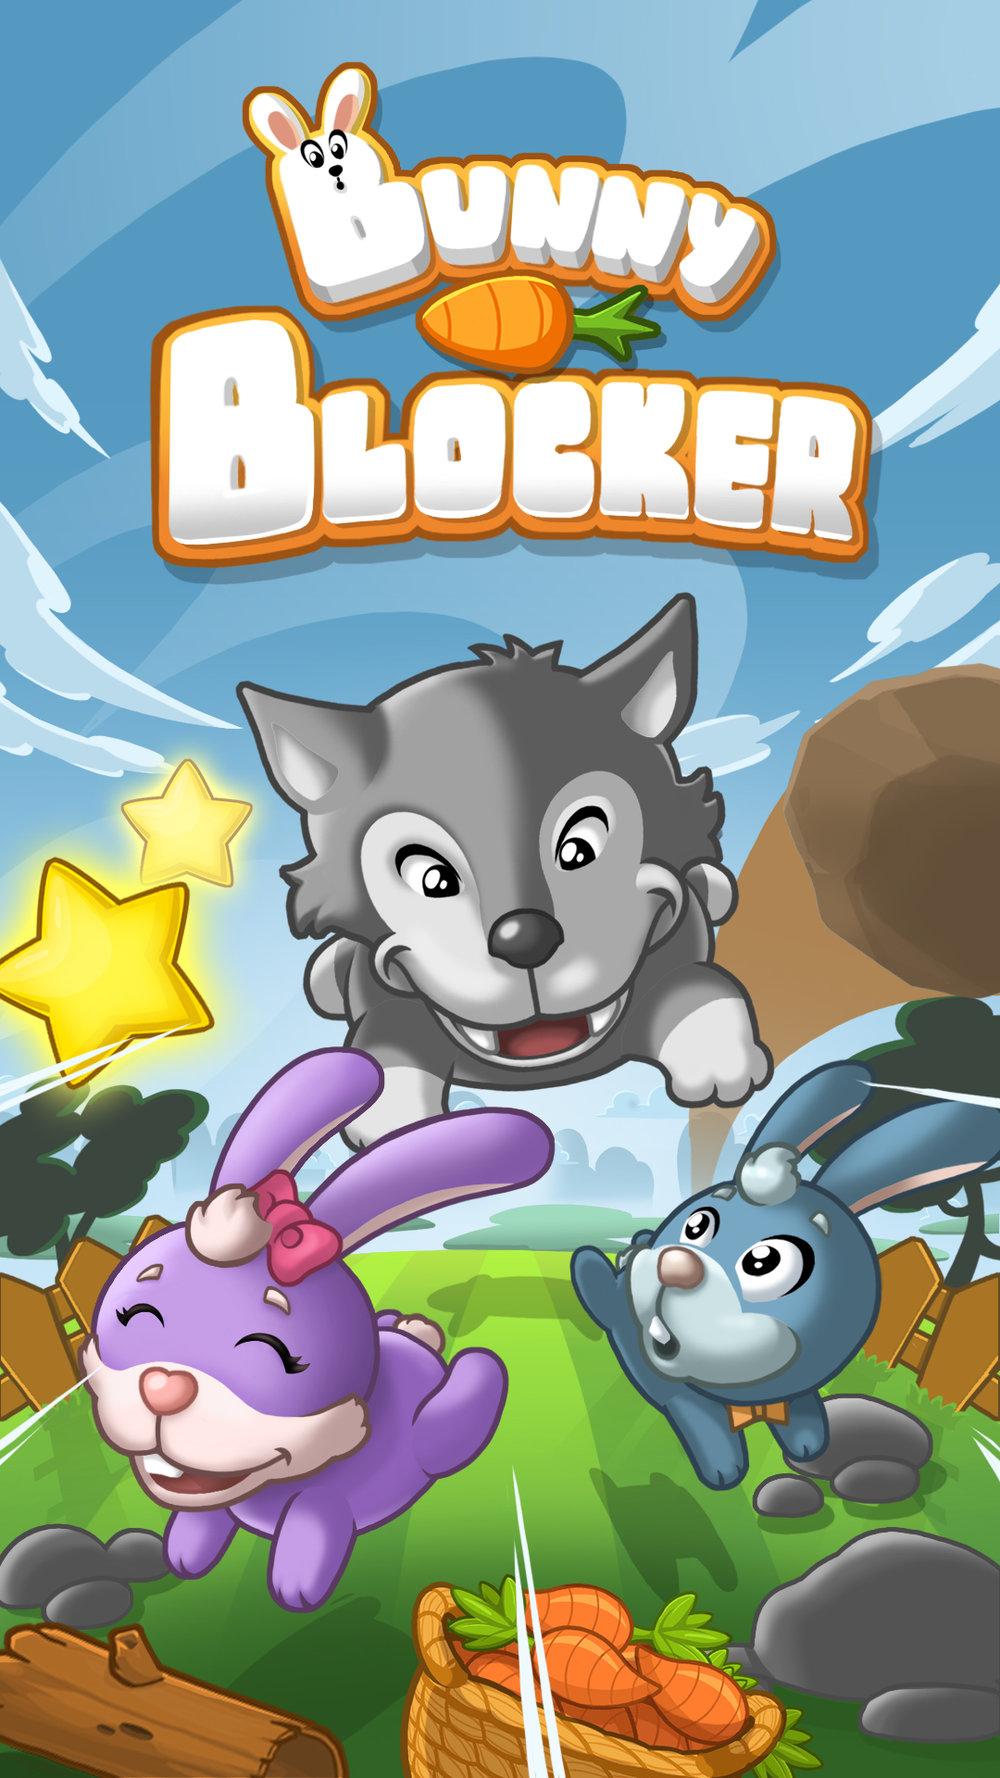 bunny_blocker_splash_screen.jpg